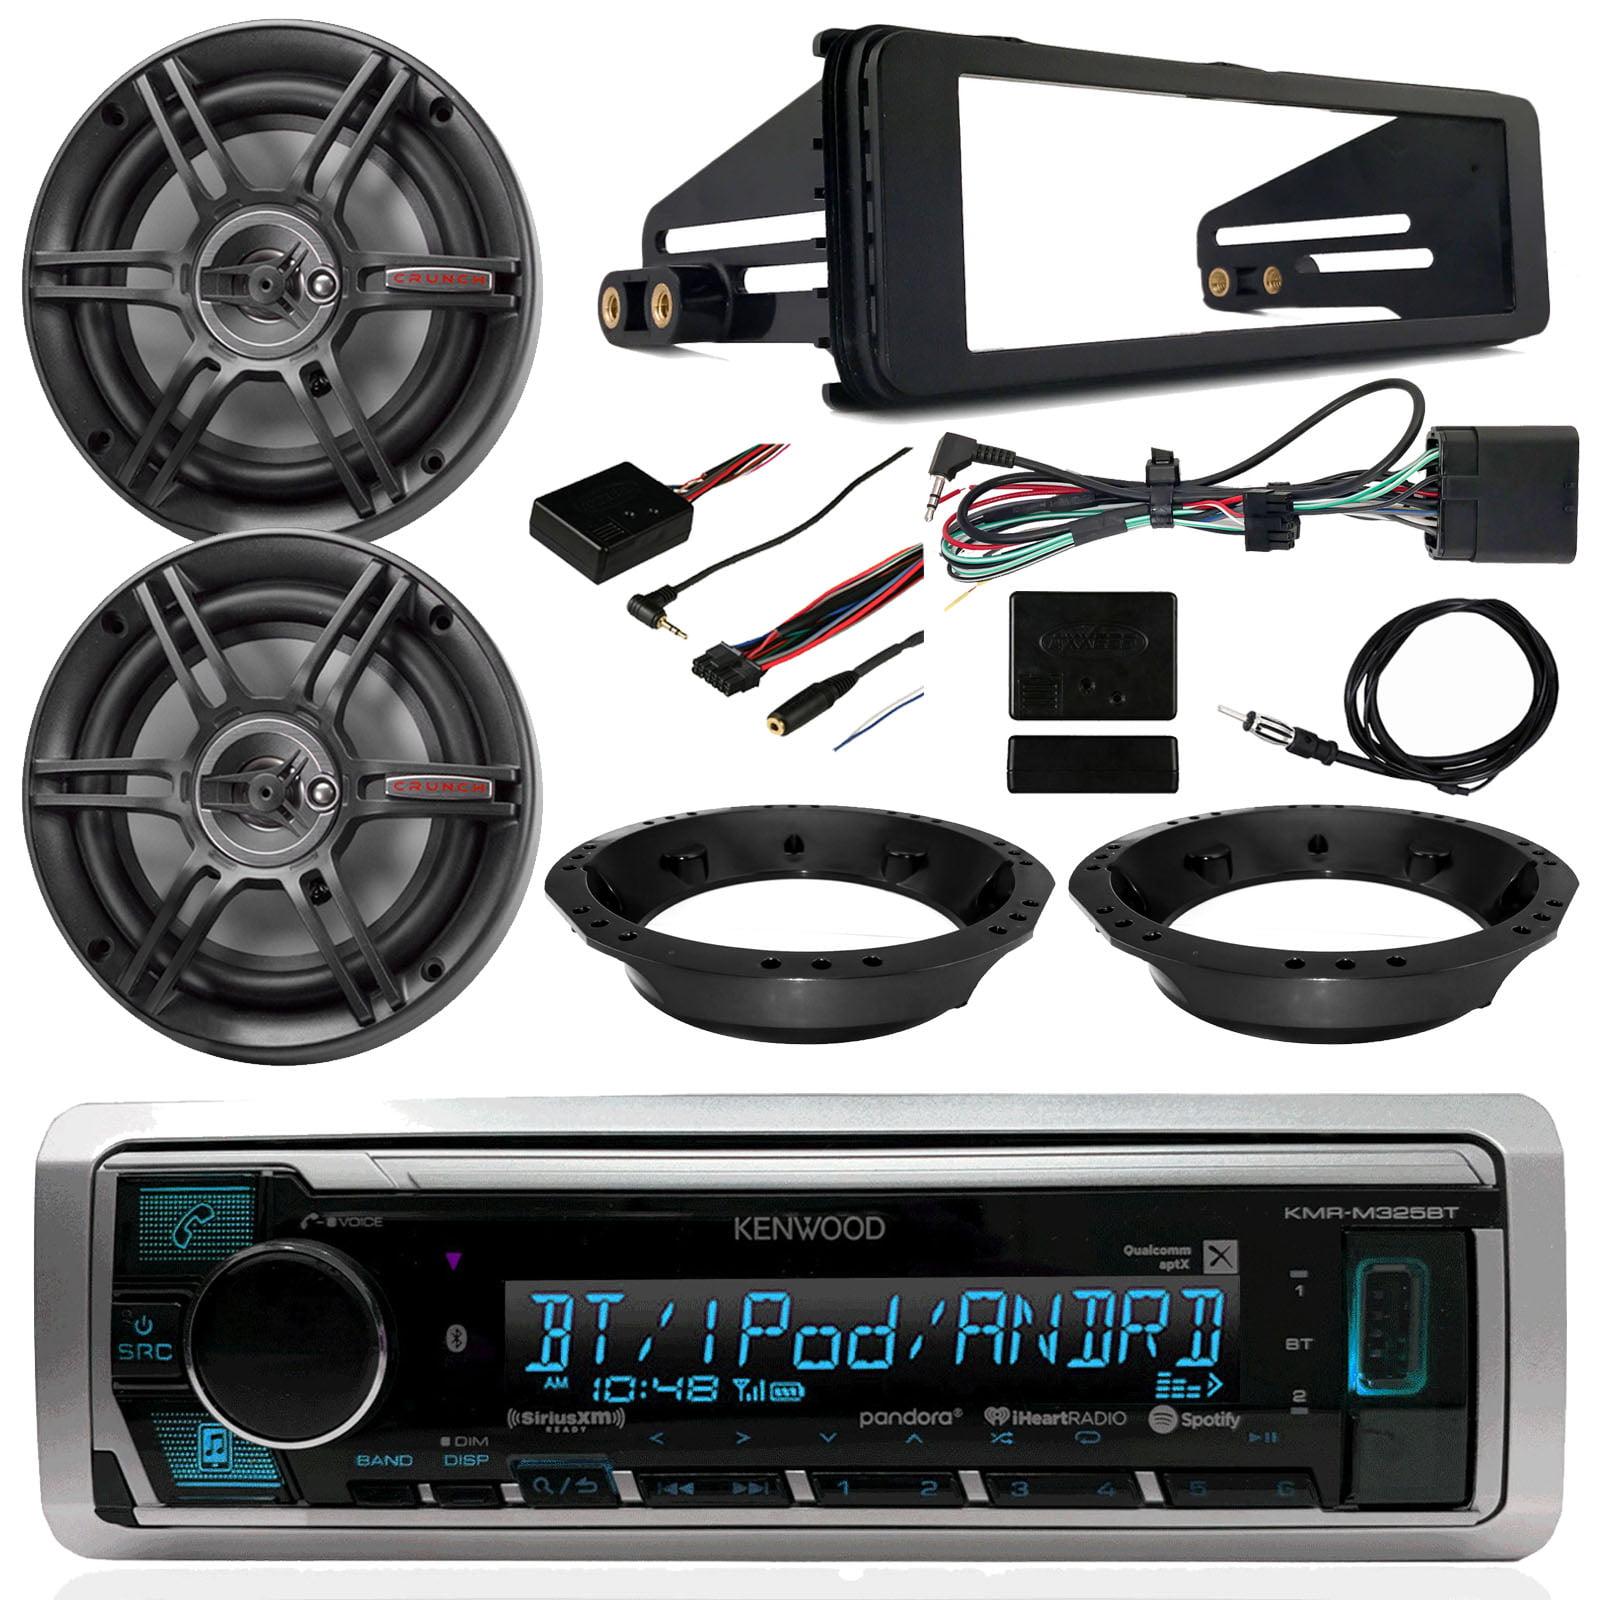 "FLHT FLHTC FLHTCU Touring Radio Package - Kenwood Digital Media Radio, 2x Crunch 3-Way 6.5"" Speakers, Harley Davidson Dash Radio Install Kit, Speaker Adapters, Thumb Control Module, Antenna"